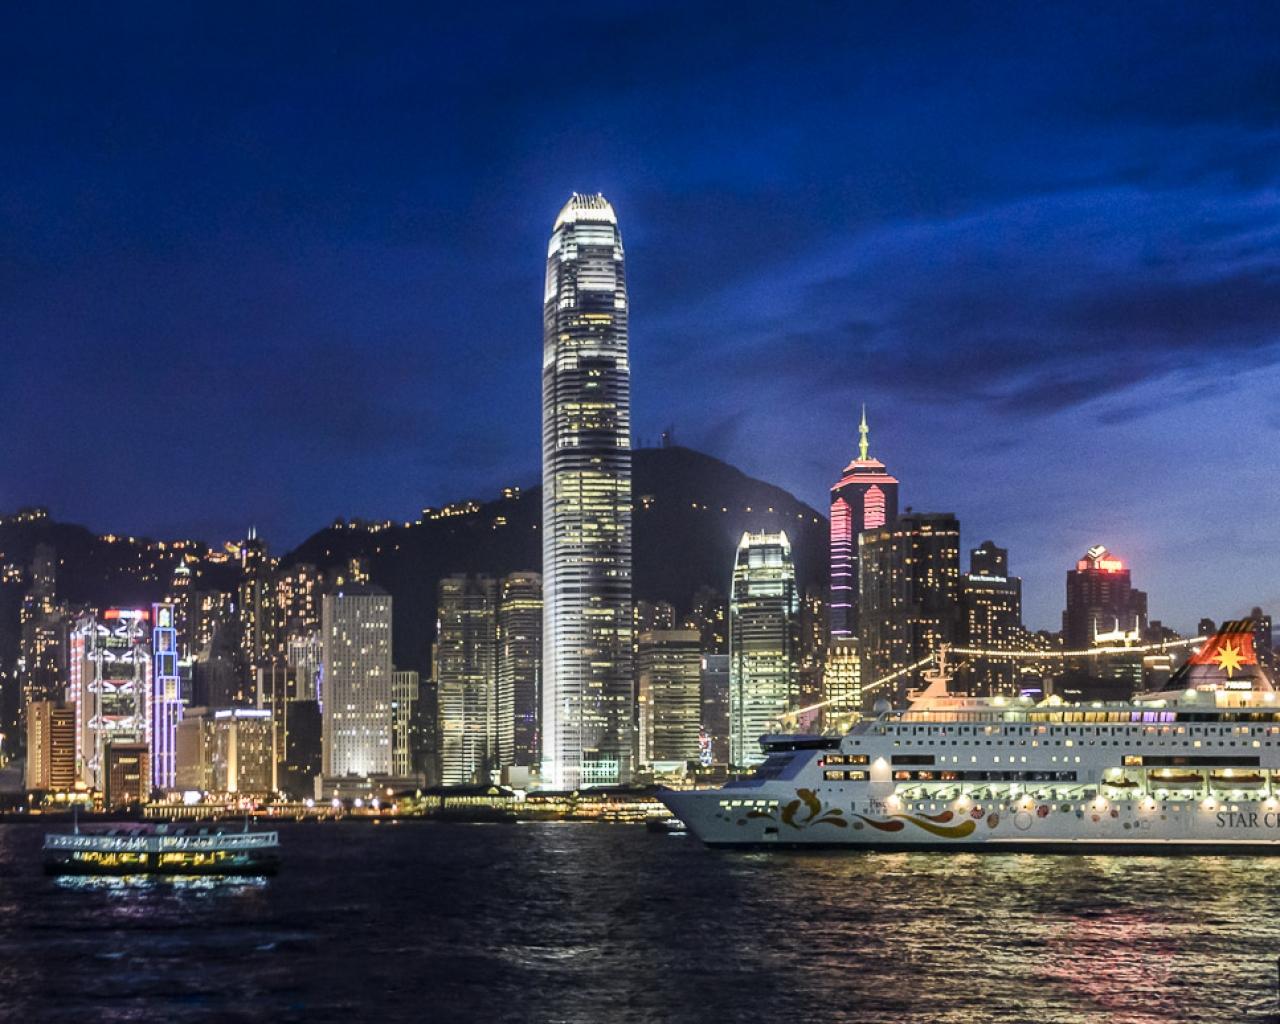 Victoria Harbour, Hong Kong - 1280x1024